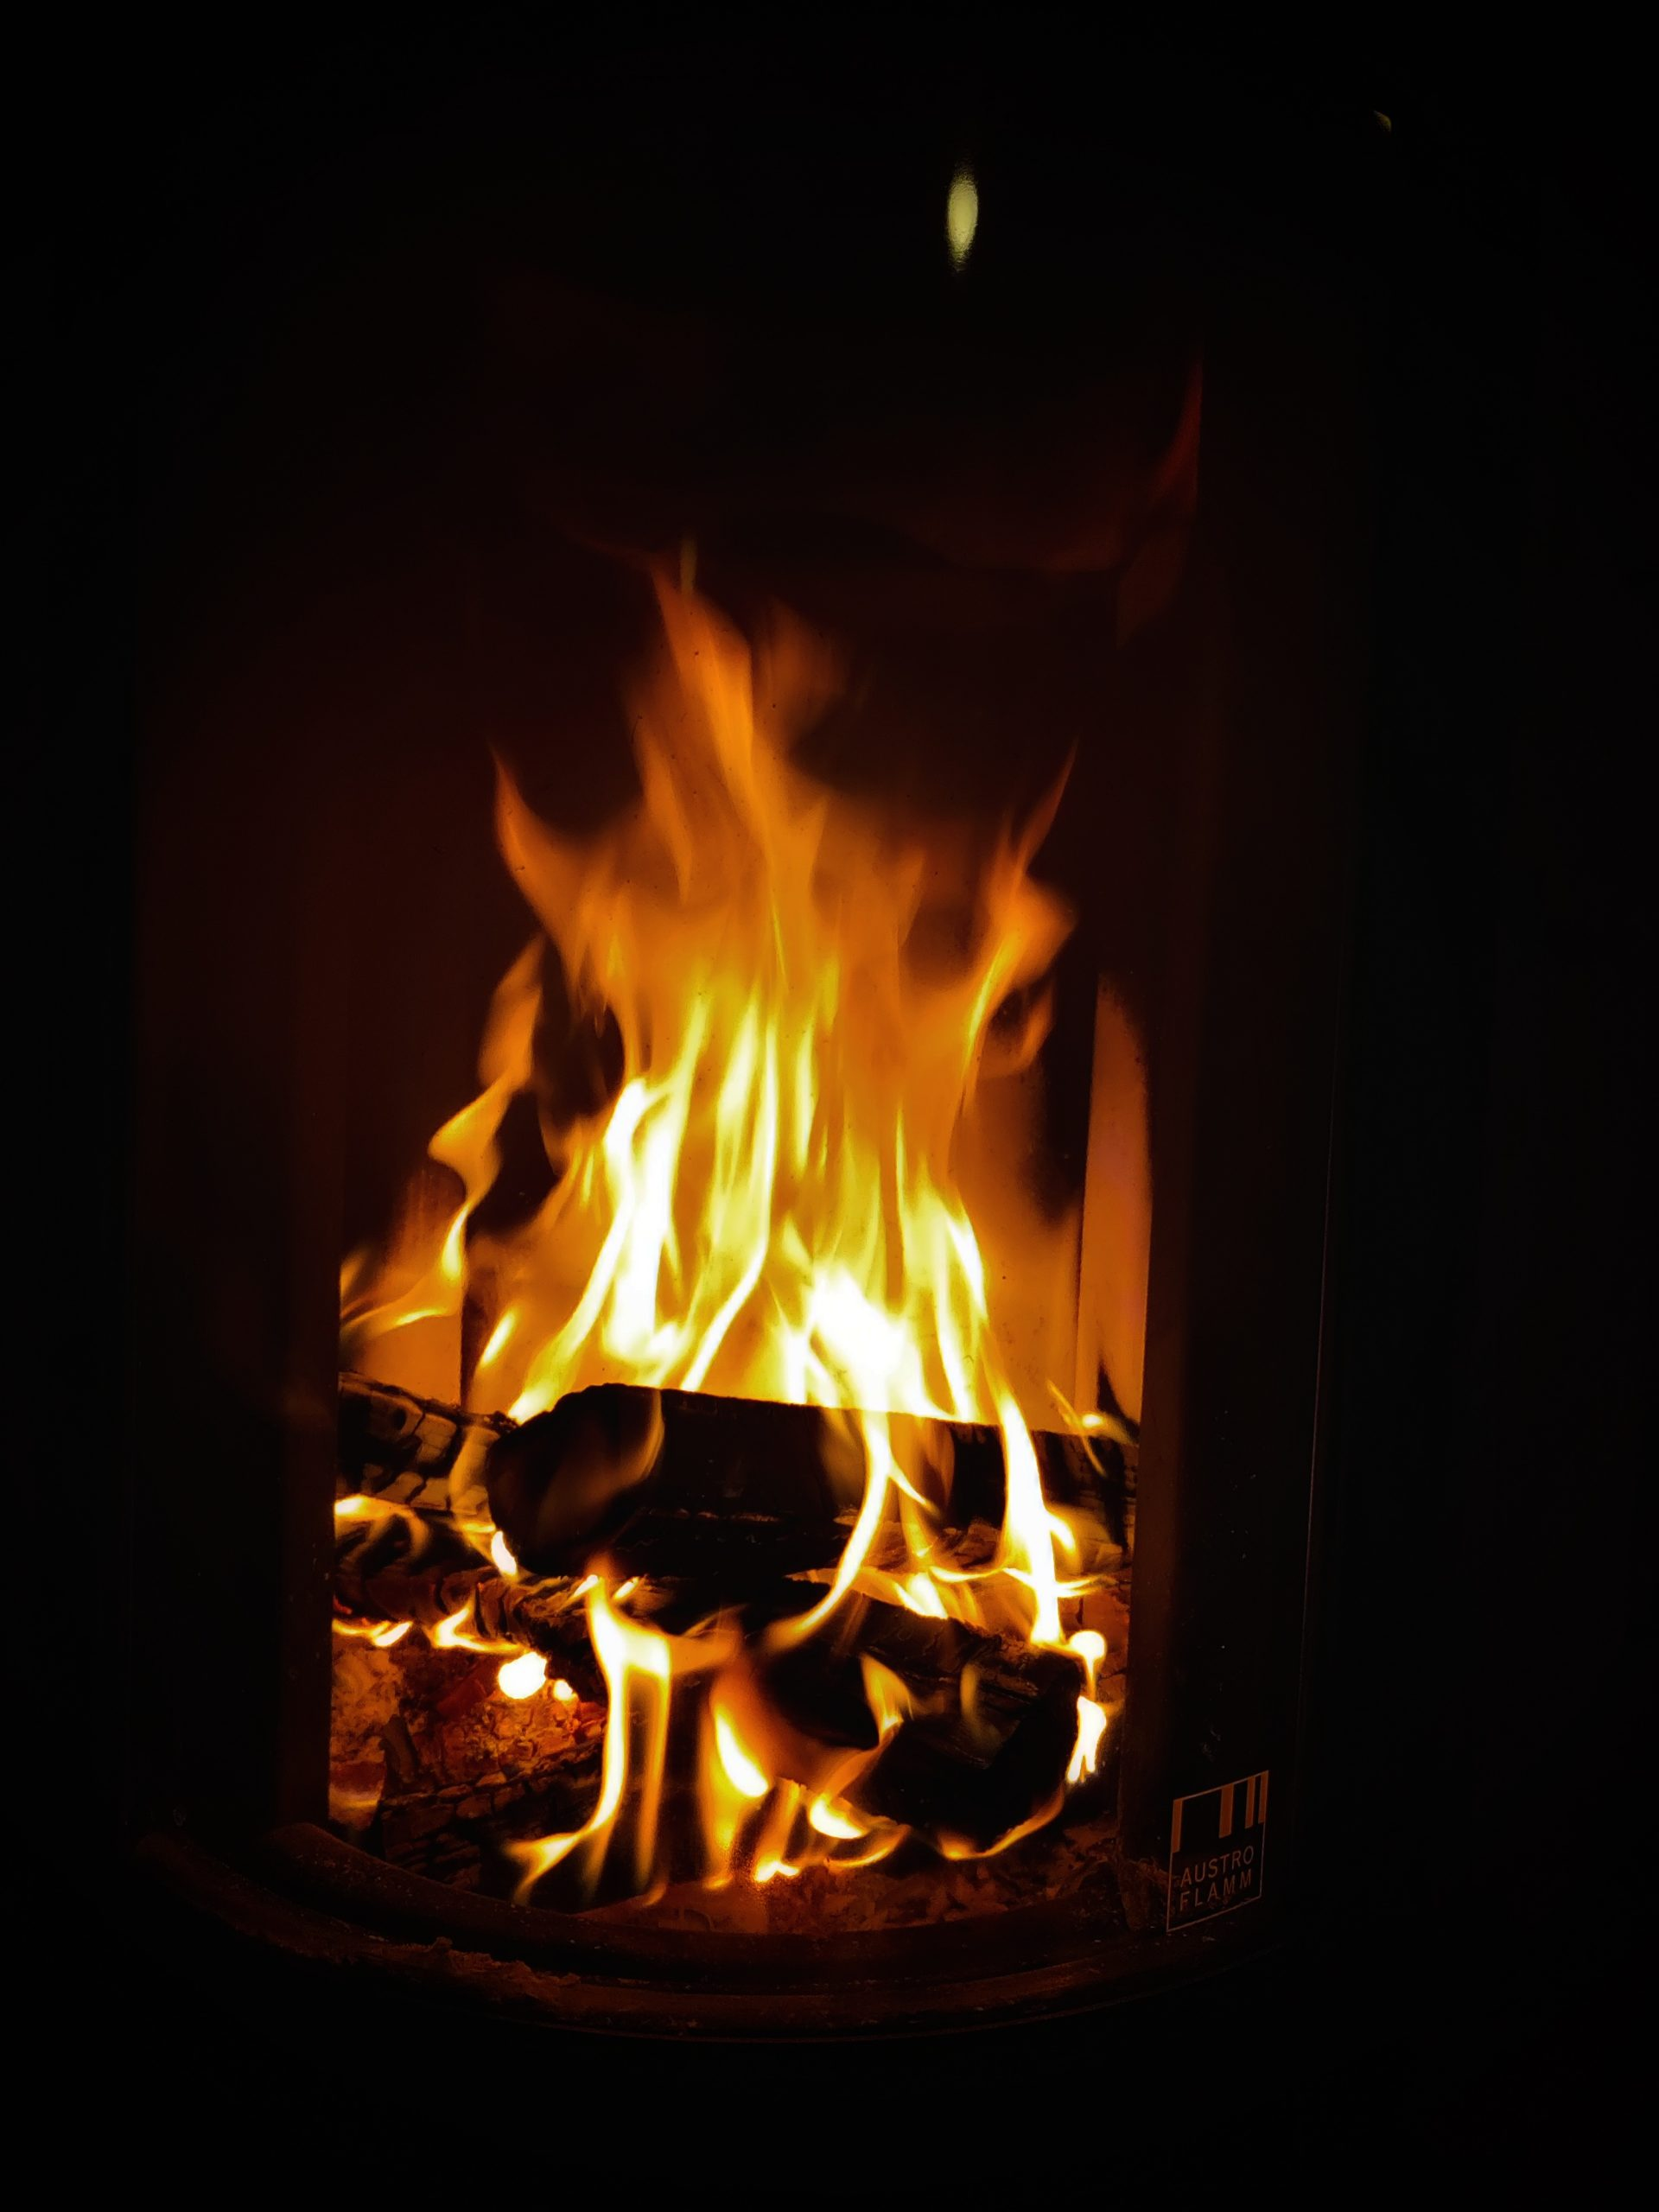 Fire in my fireplace